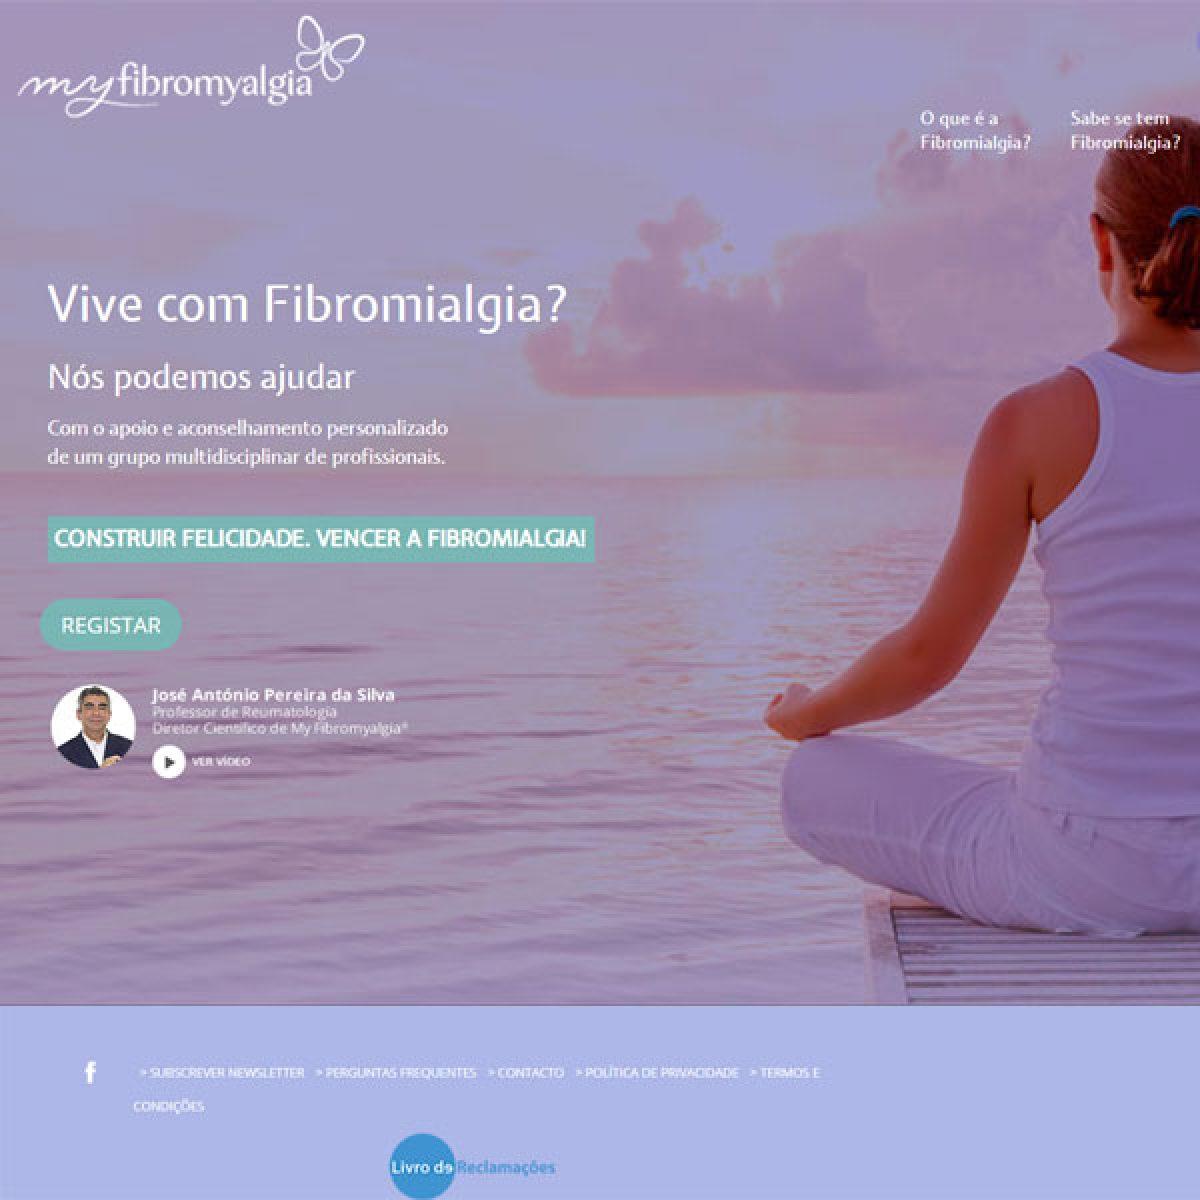 Fibromyalgia Página Exemplo